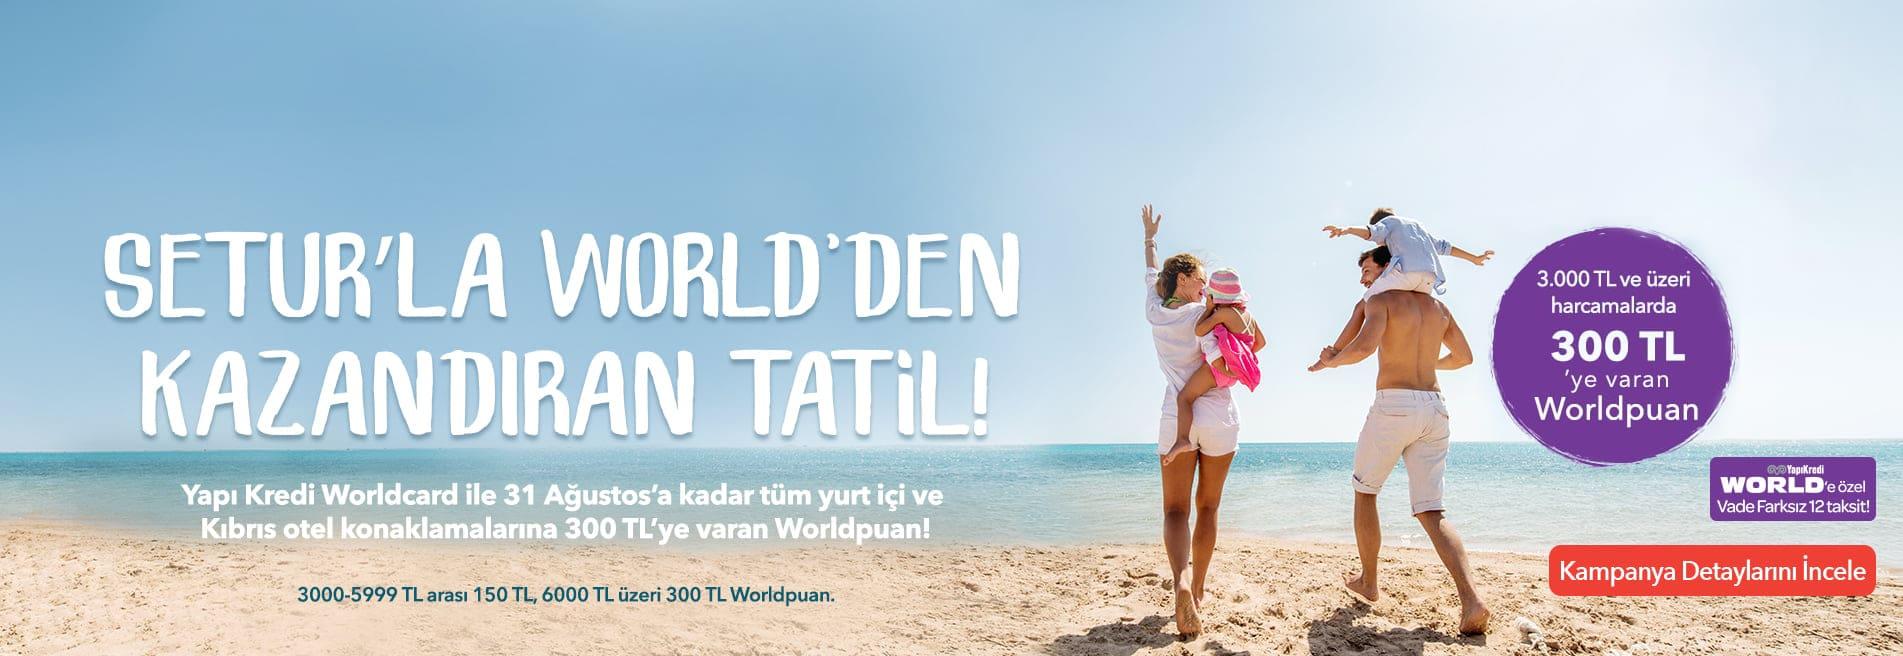 yurtici otel world kampanyasi